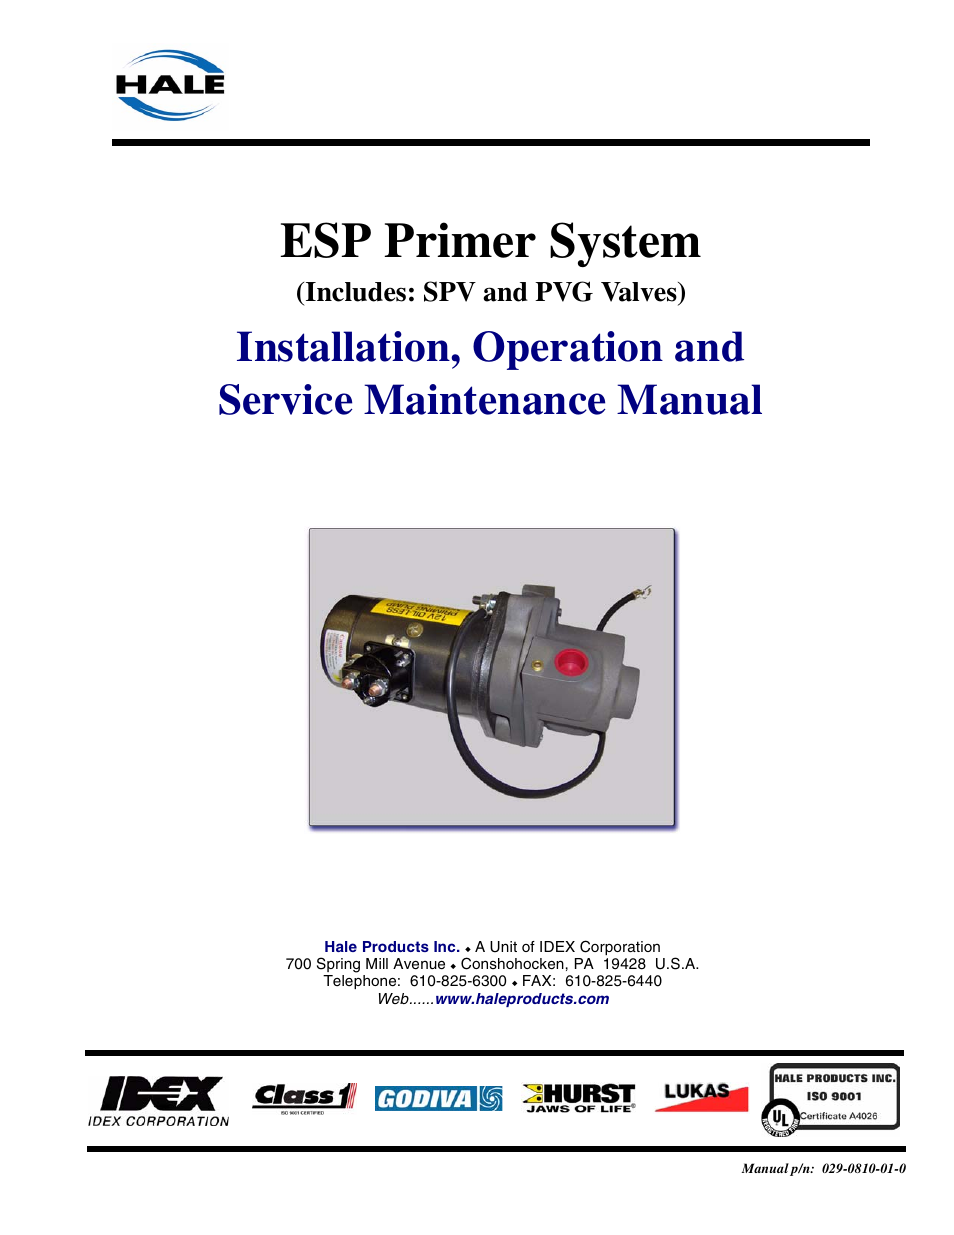 Hale Esp Priming System User Manual 70 Pages Wiring Diagram